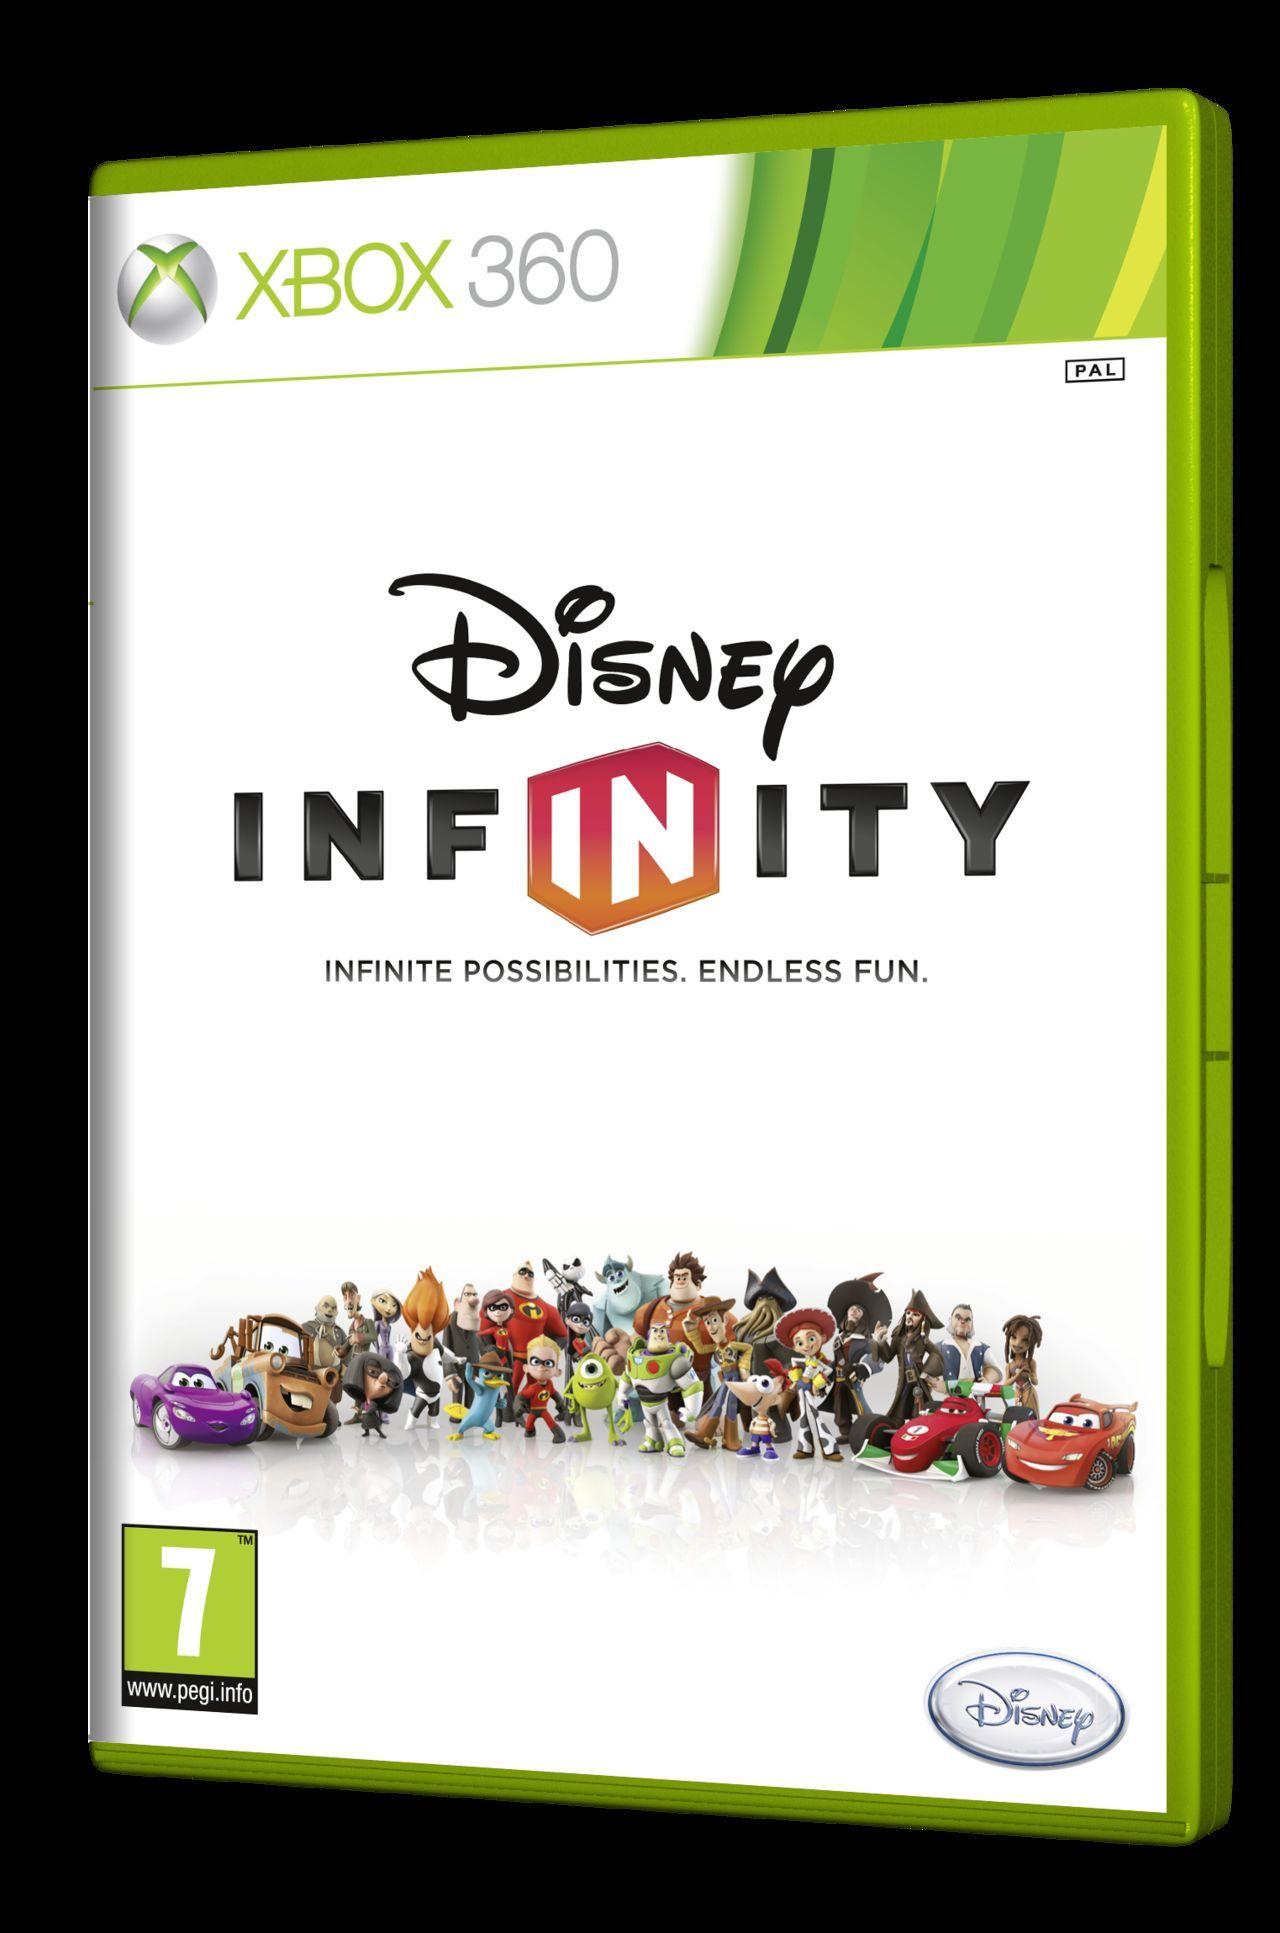 disney infinity xbox 360 - HD1280×1933